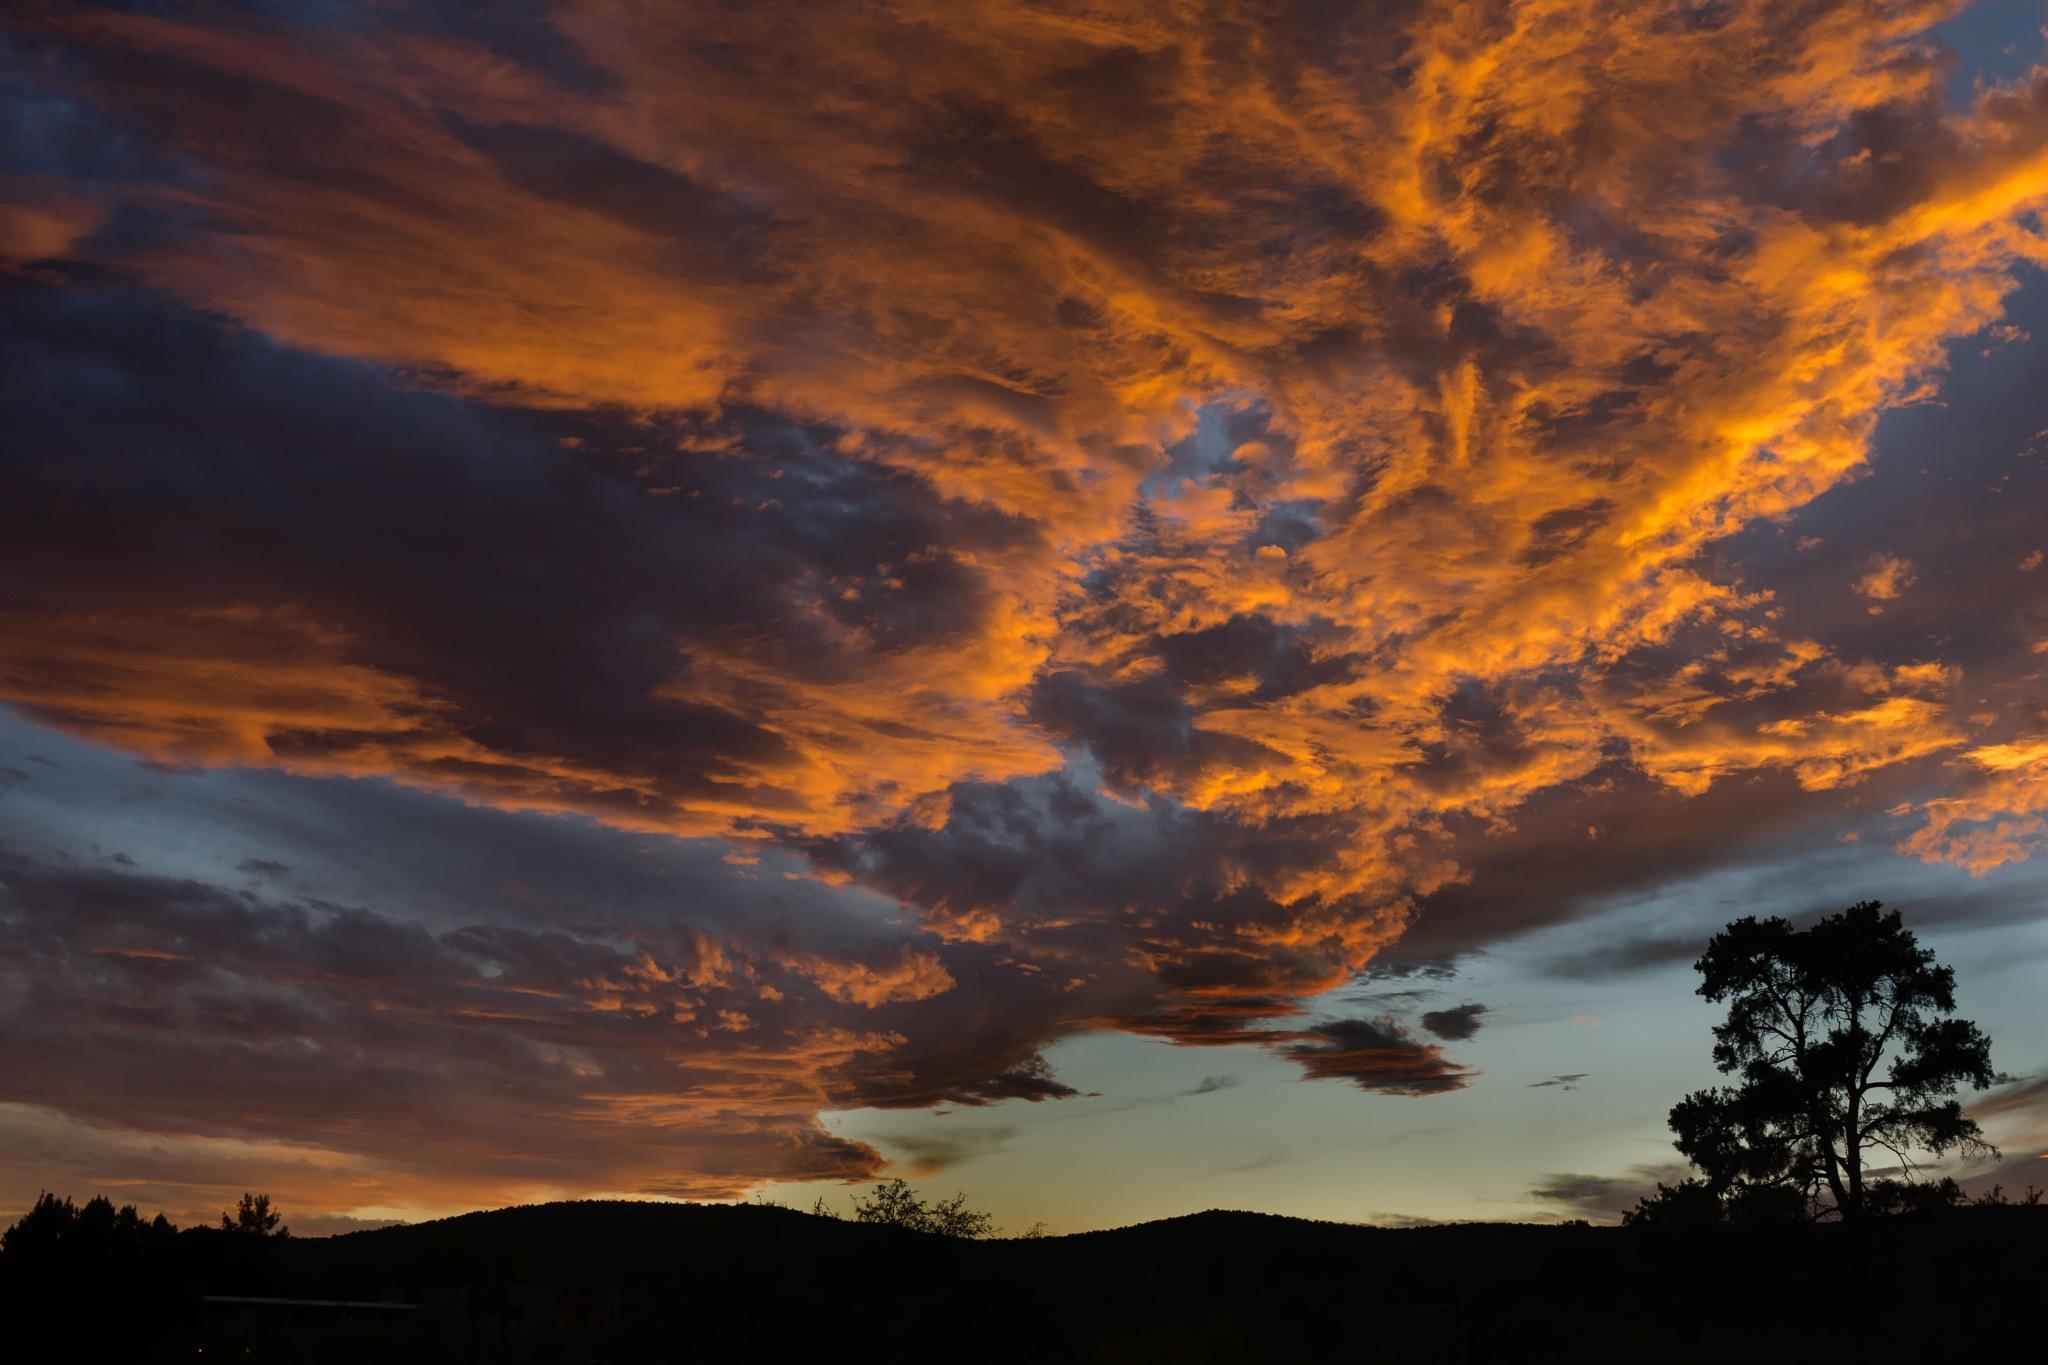 Runaway sunset over Sedona, AZ by John Mark Jennings